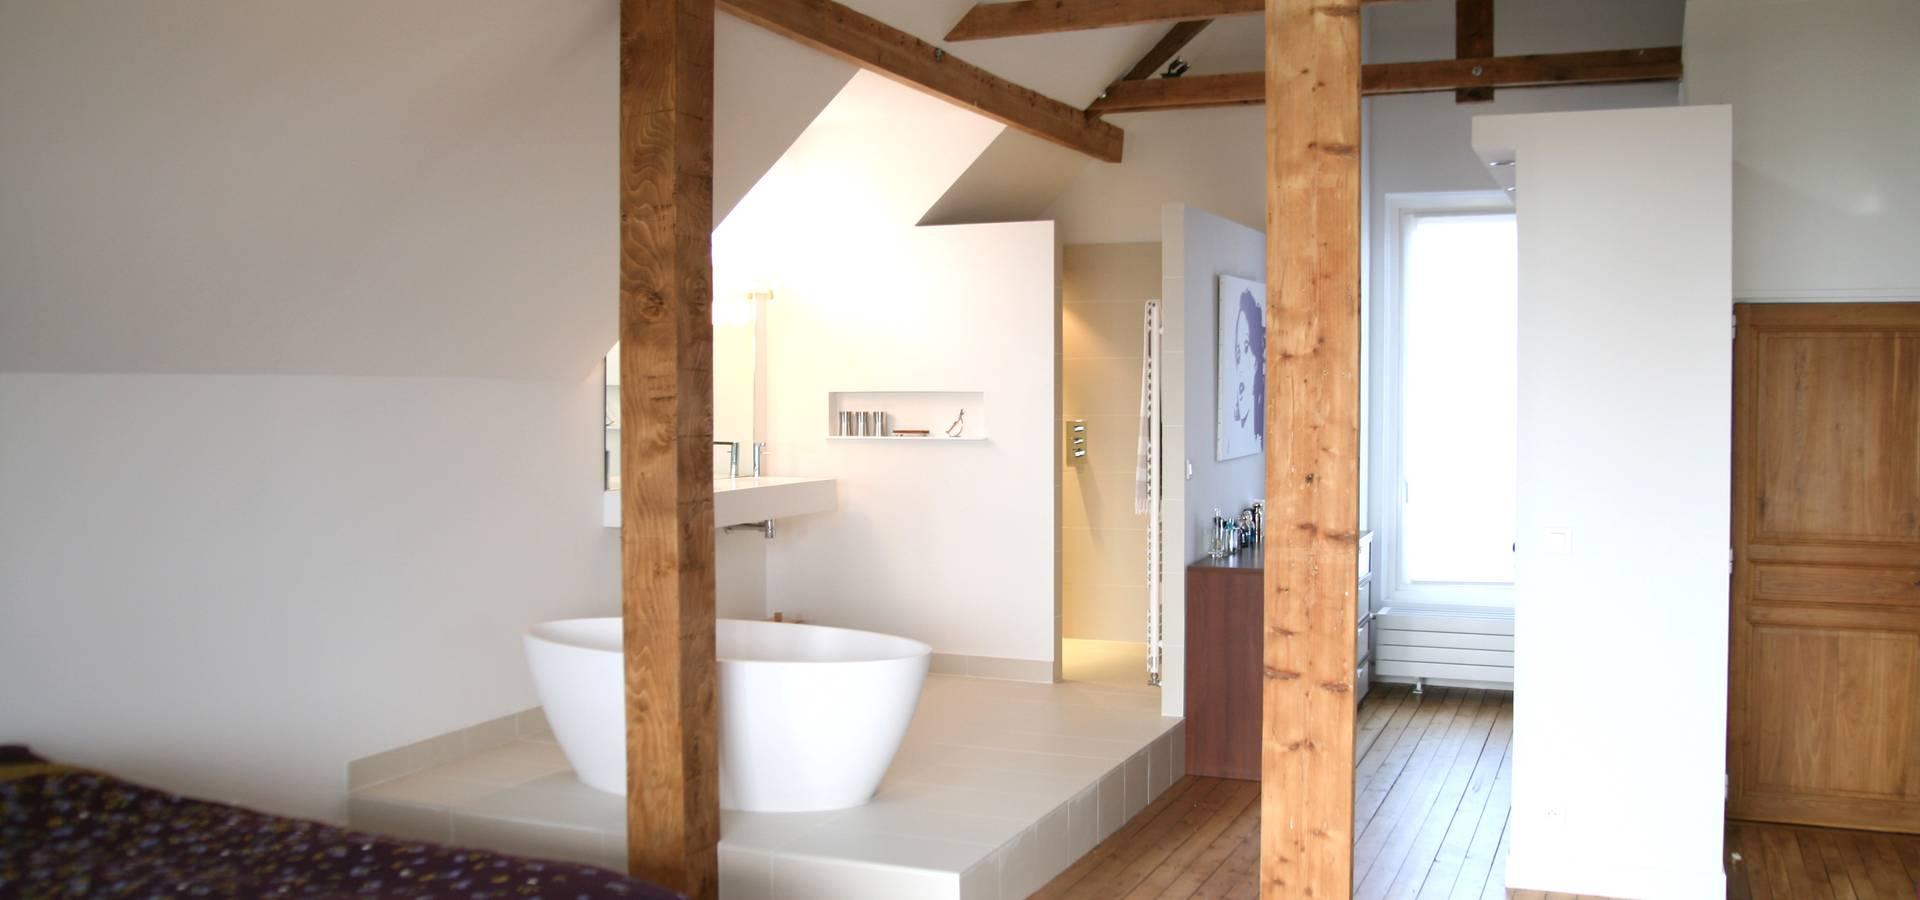 chiara colombini arquitectos de interiores en les mesnuls homify. Black Bedroom Furniture Sets. Home Design Ideas